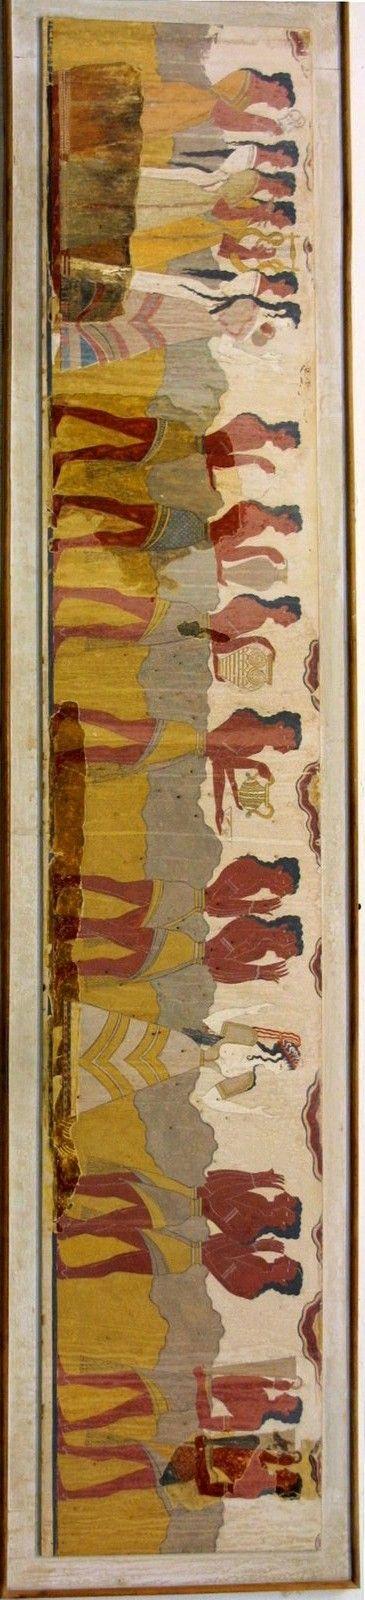 Bronze age Etruscan fresco Crete